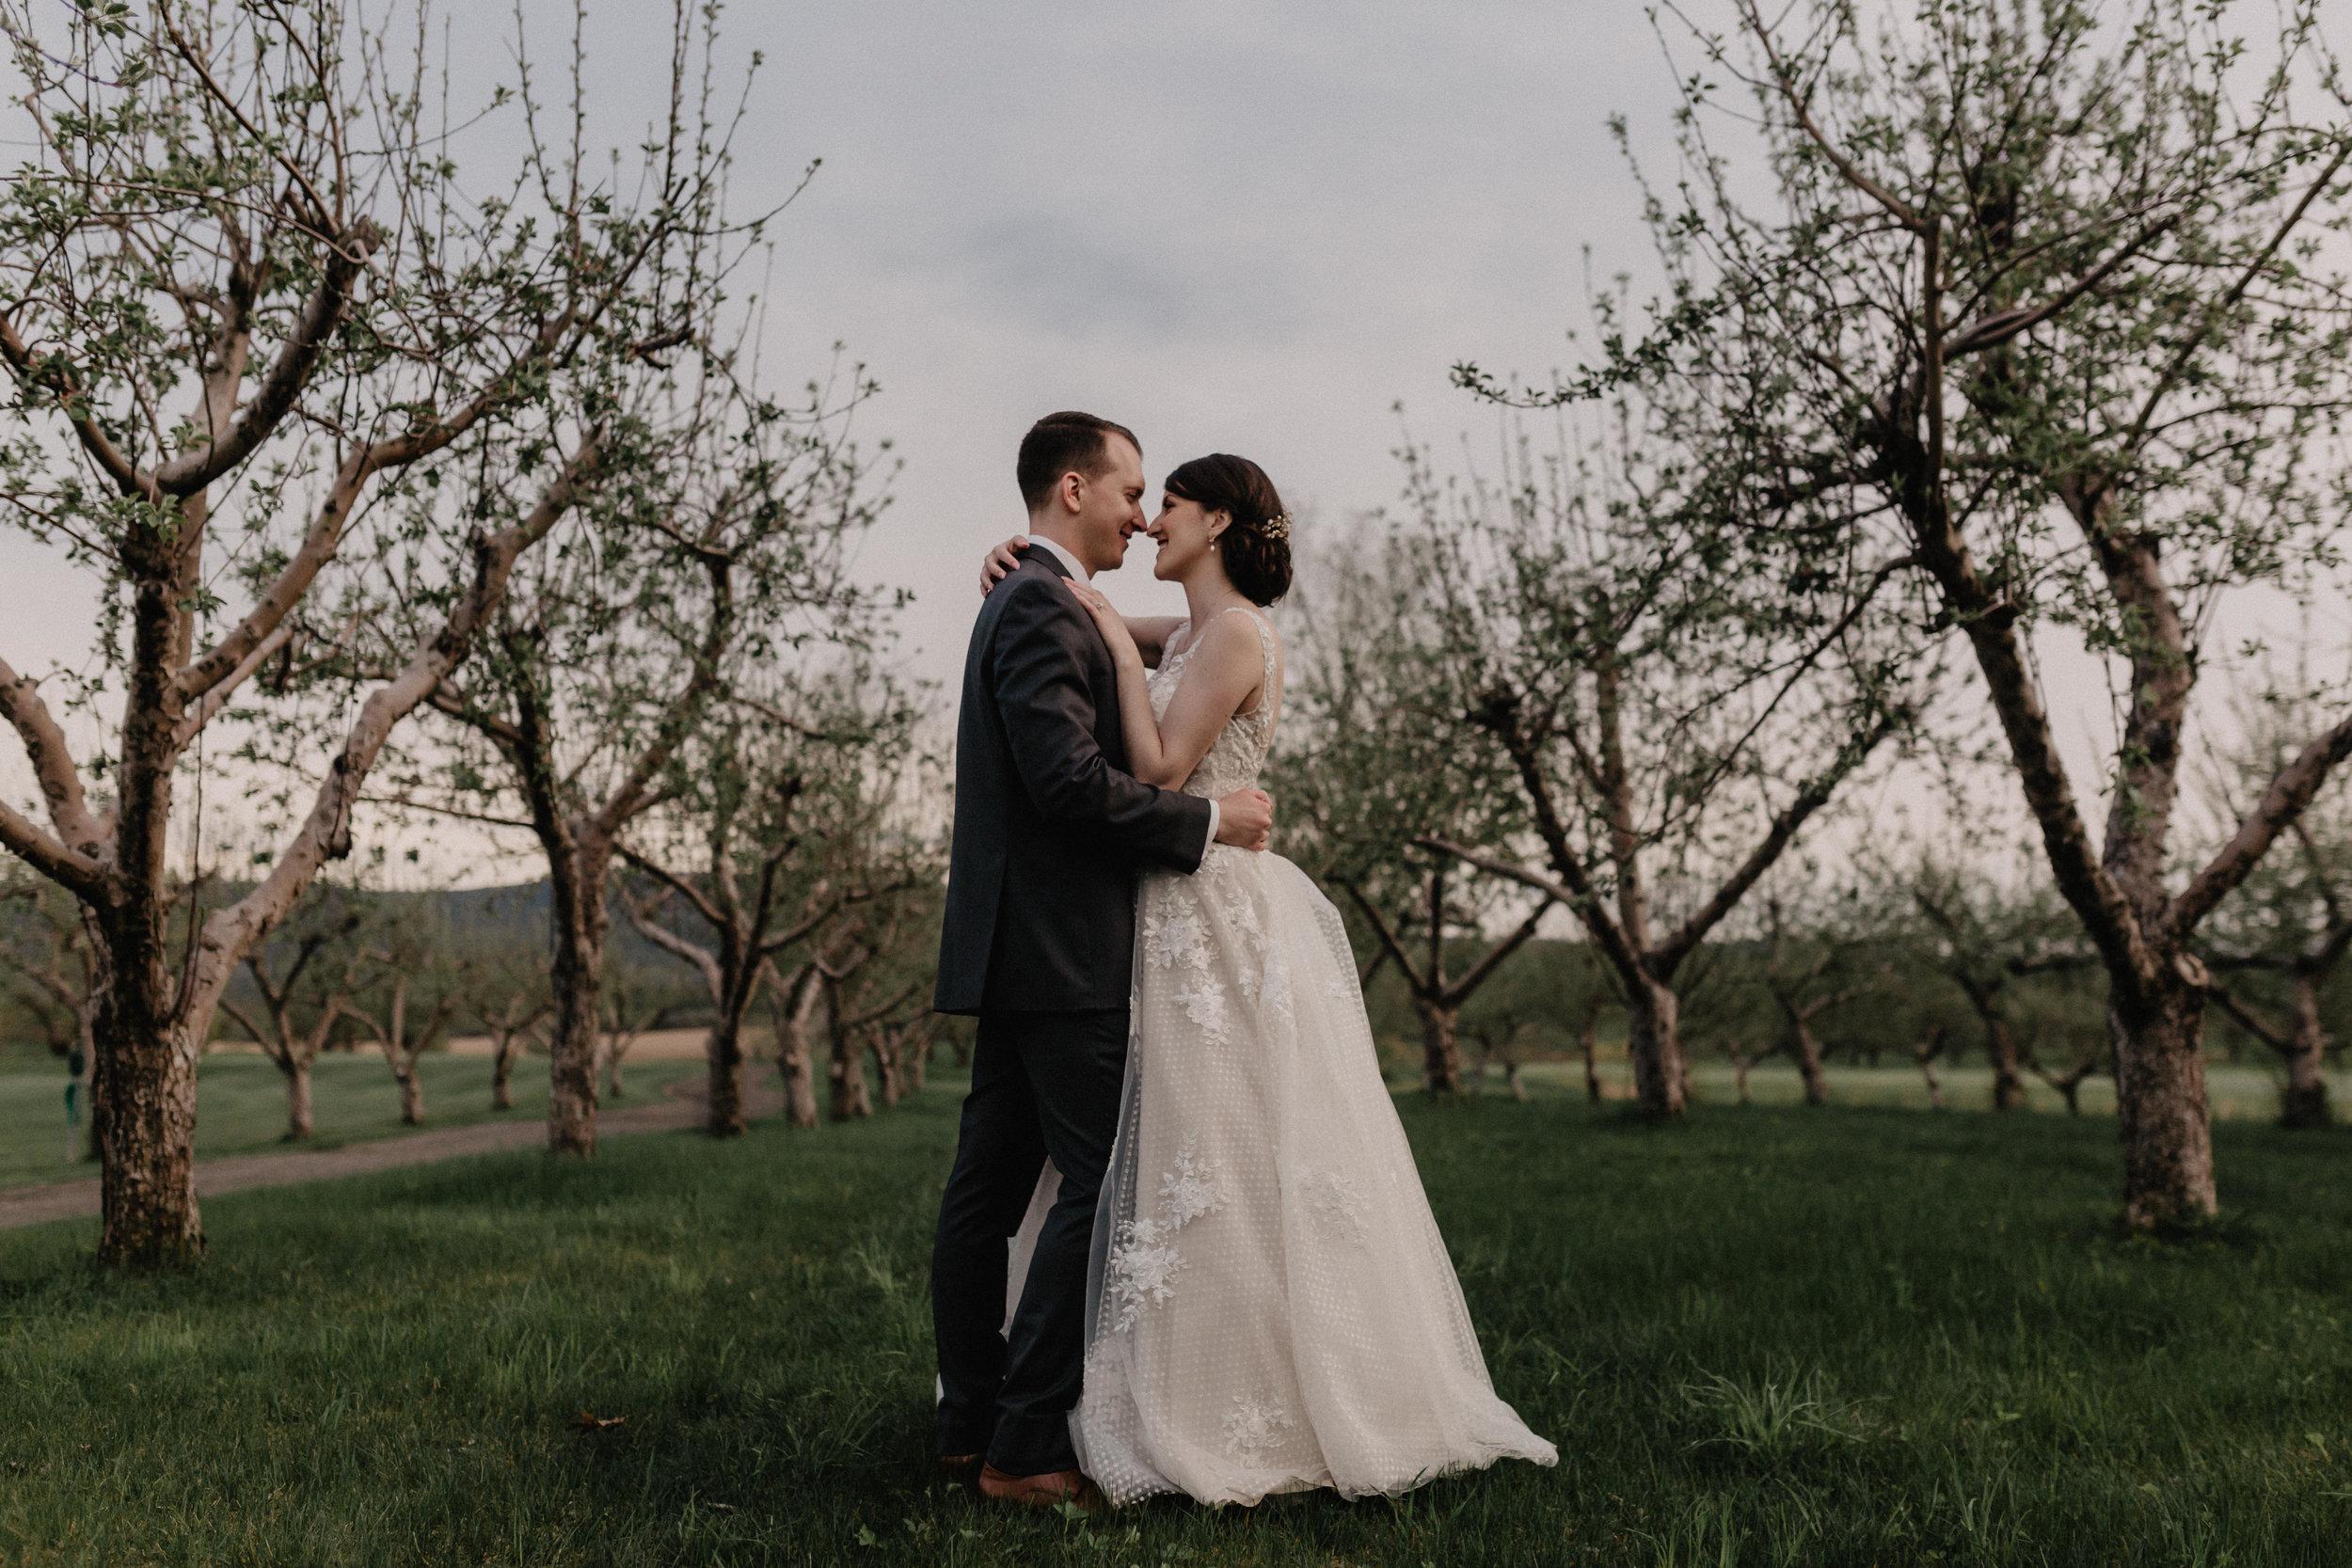 orchard-creek-wedding_064.jpg